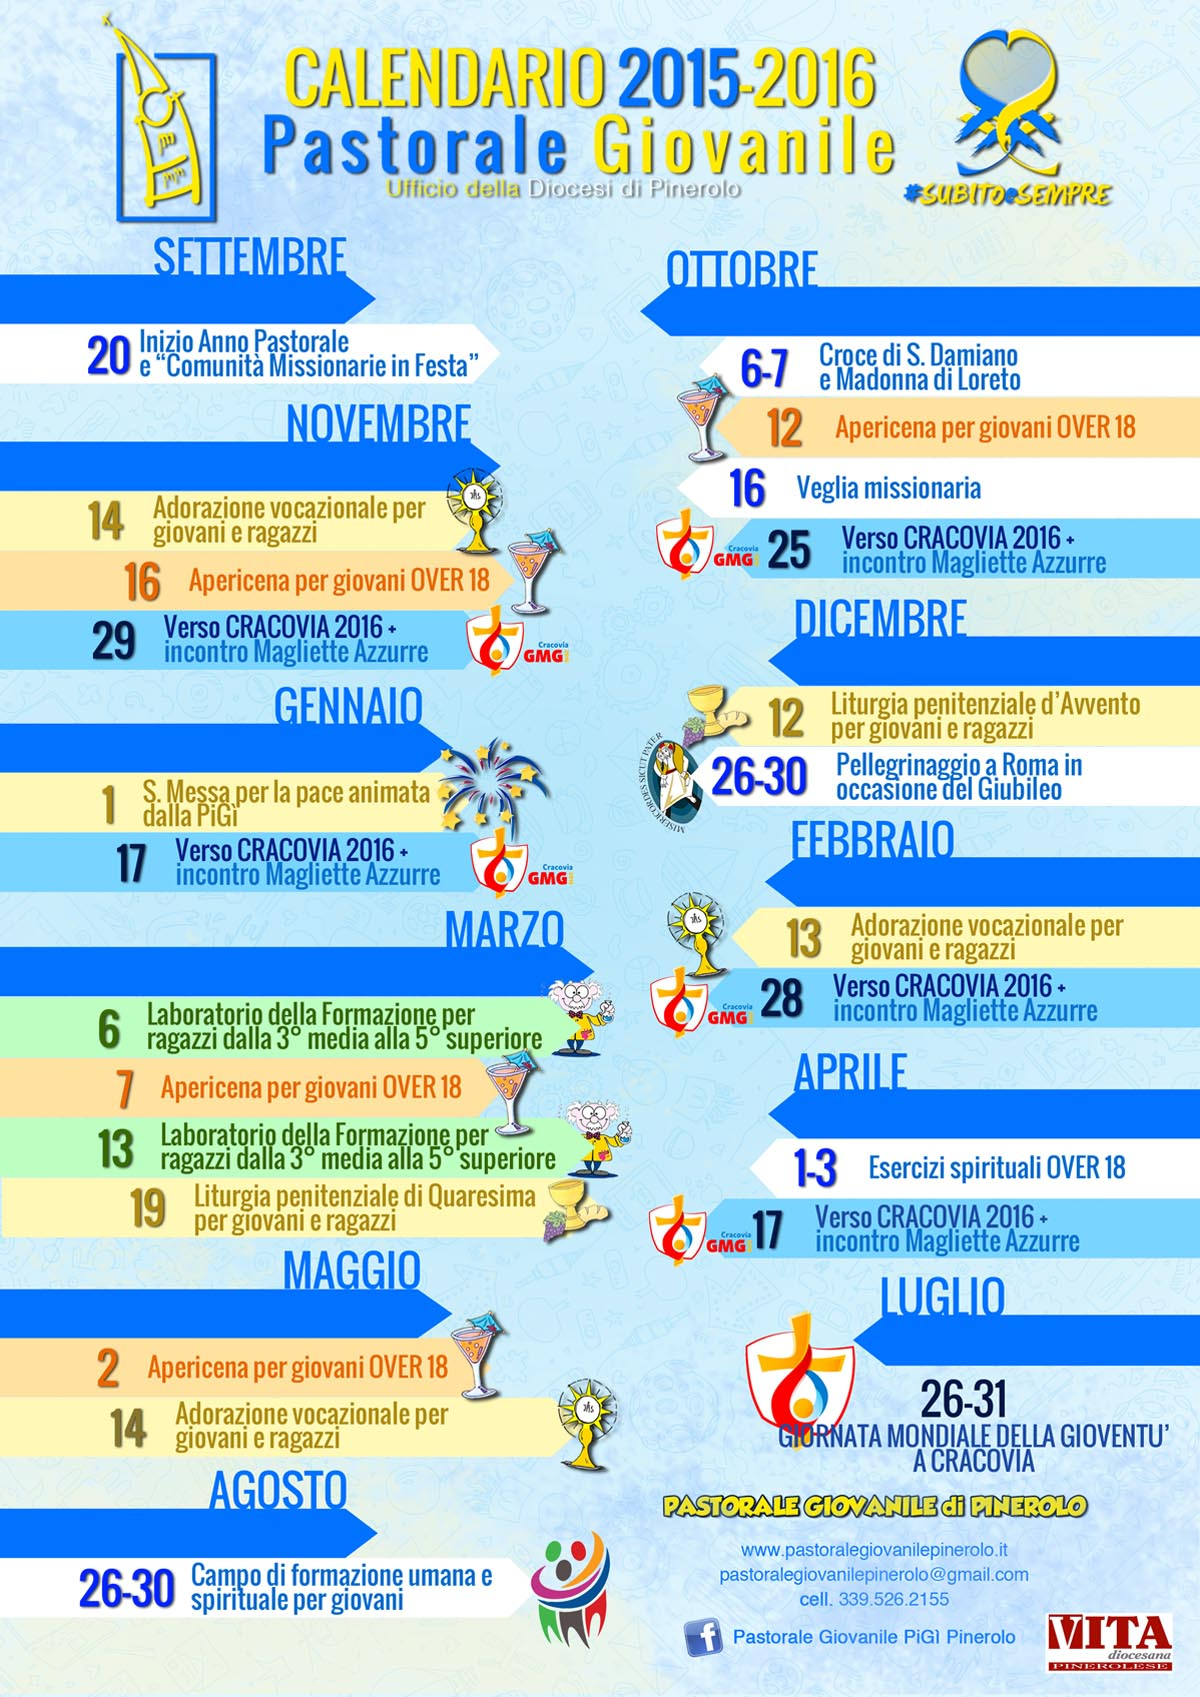 Calendario PiGì 2015-2016_Sito PG